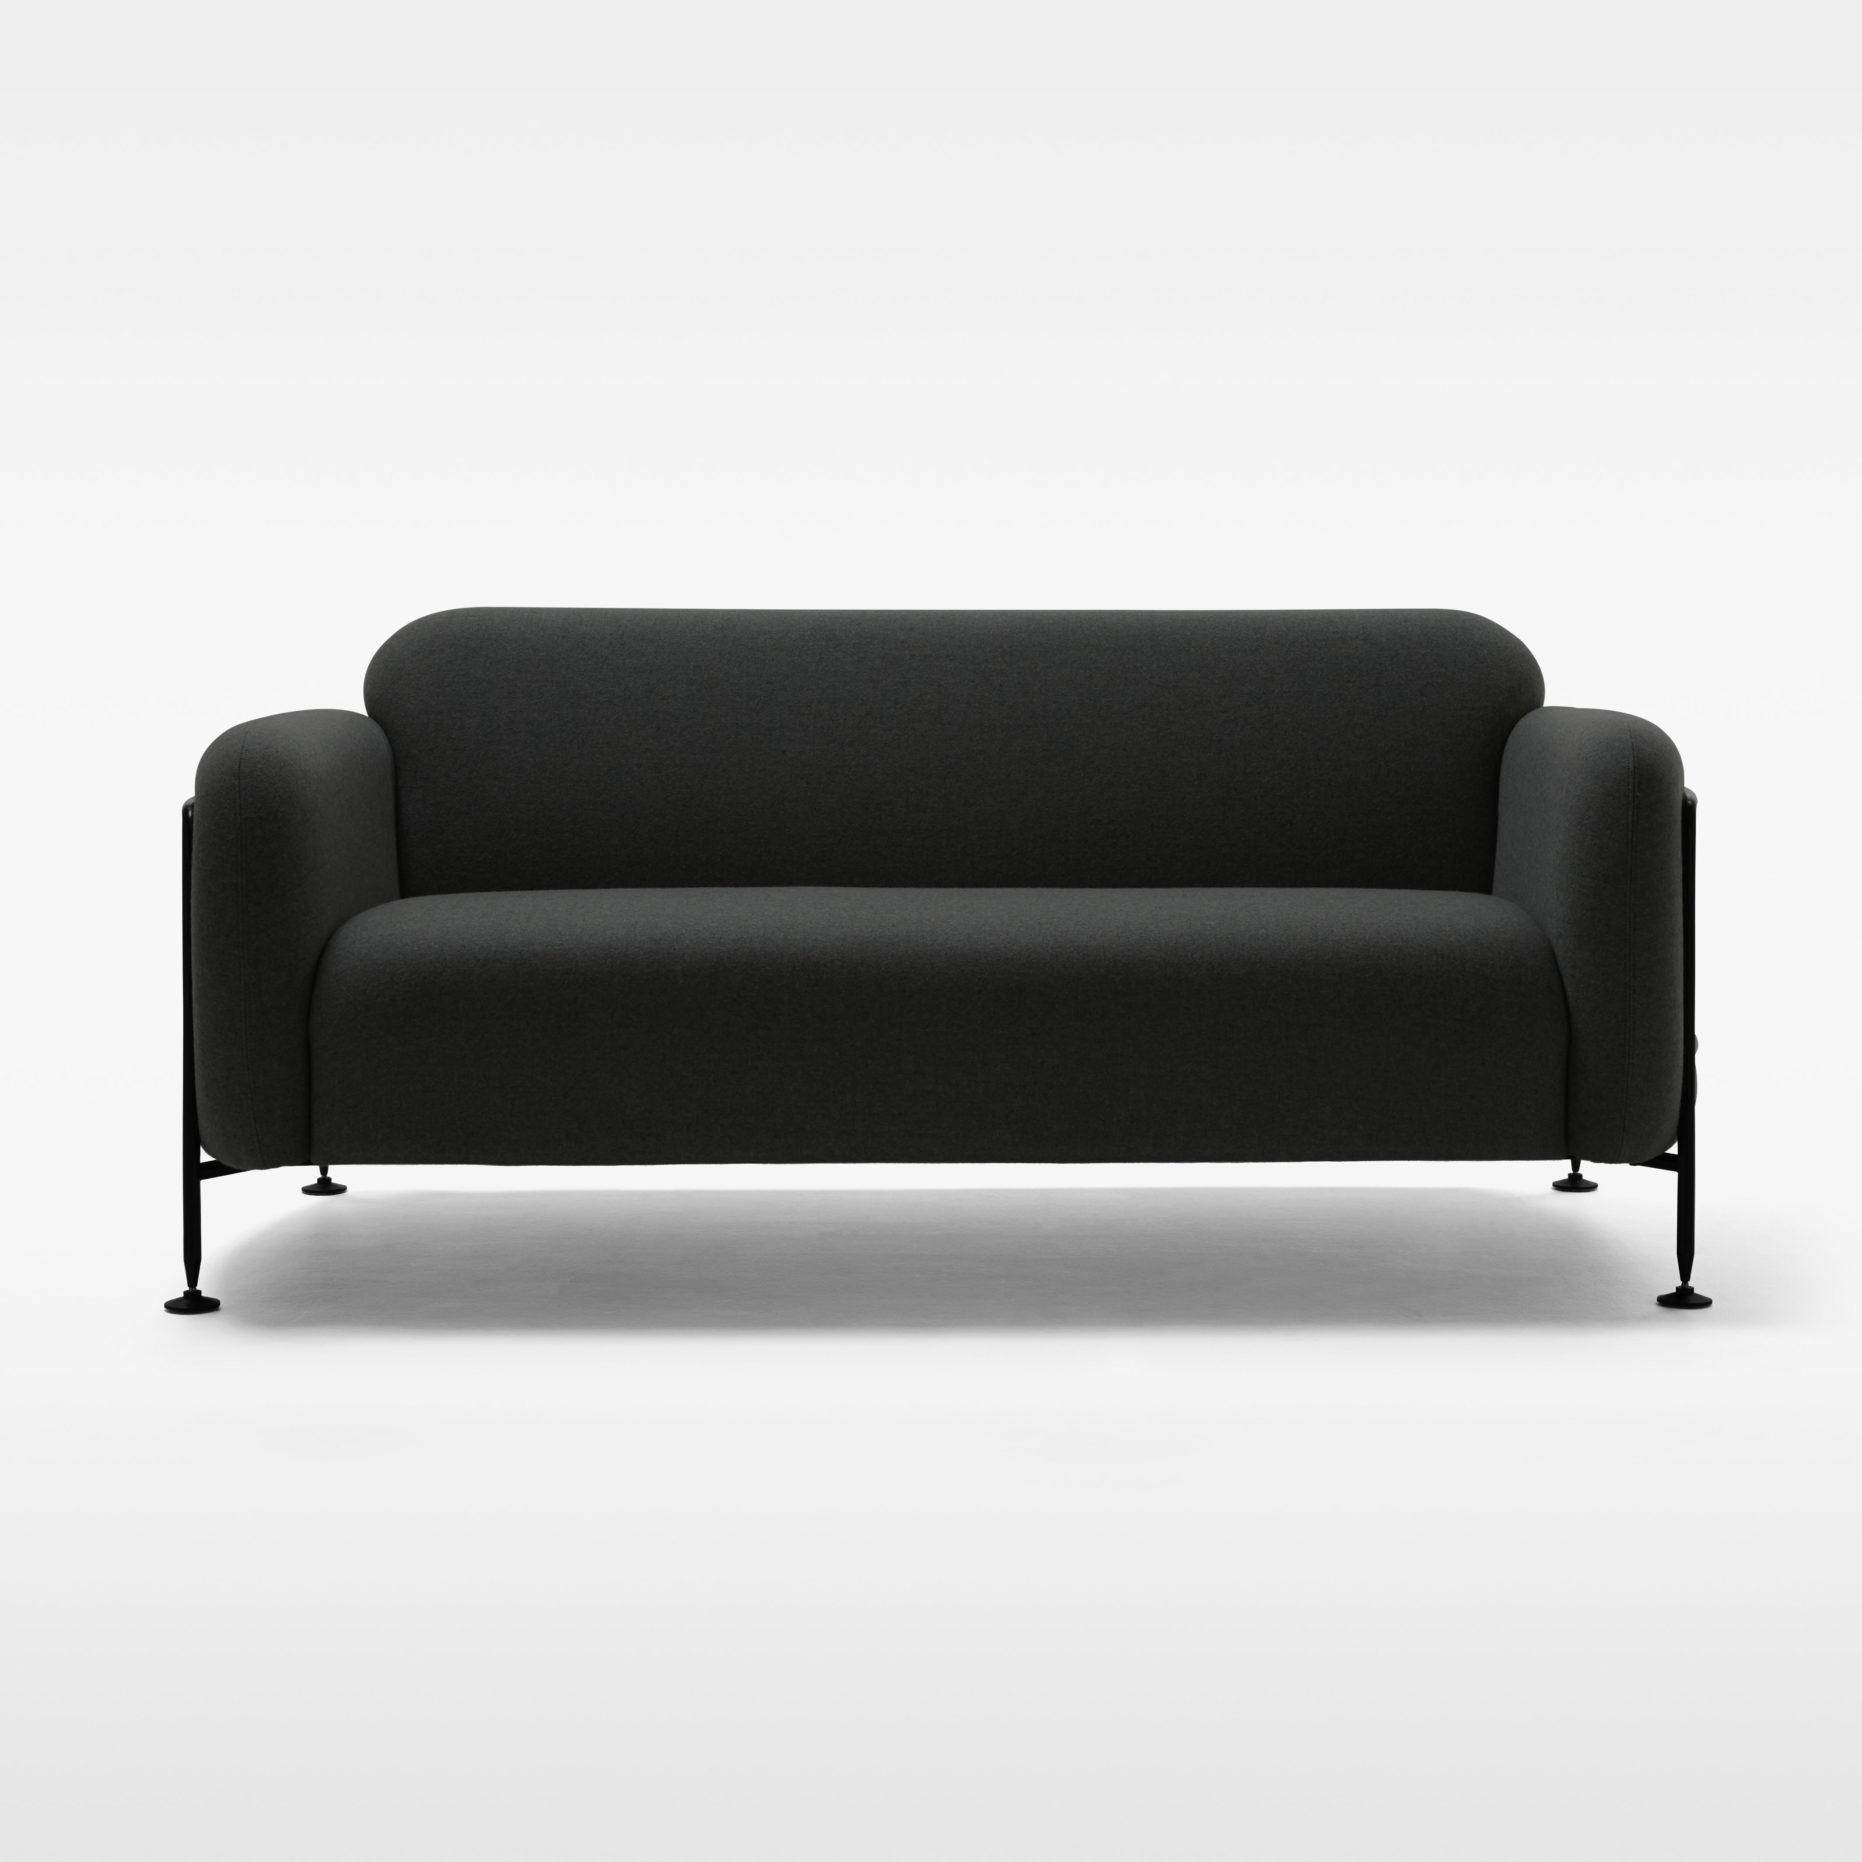 bensen lite sofa tempurpedic bed modern sofas by contemporary designers at haute living